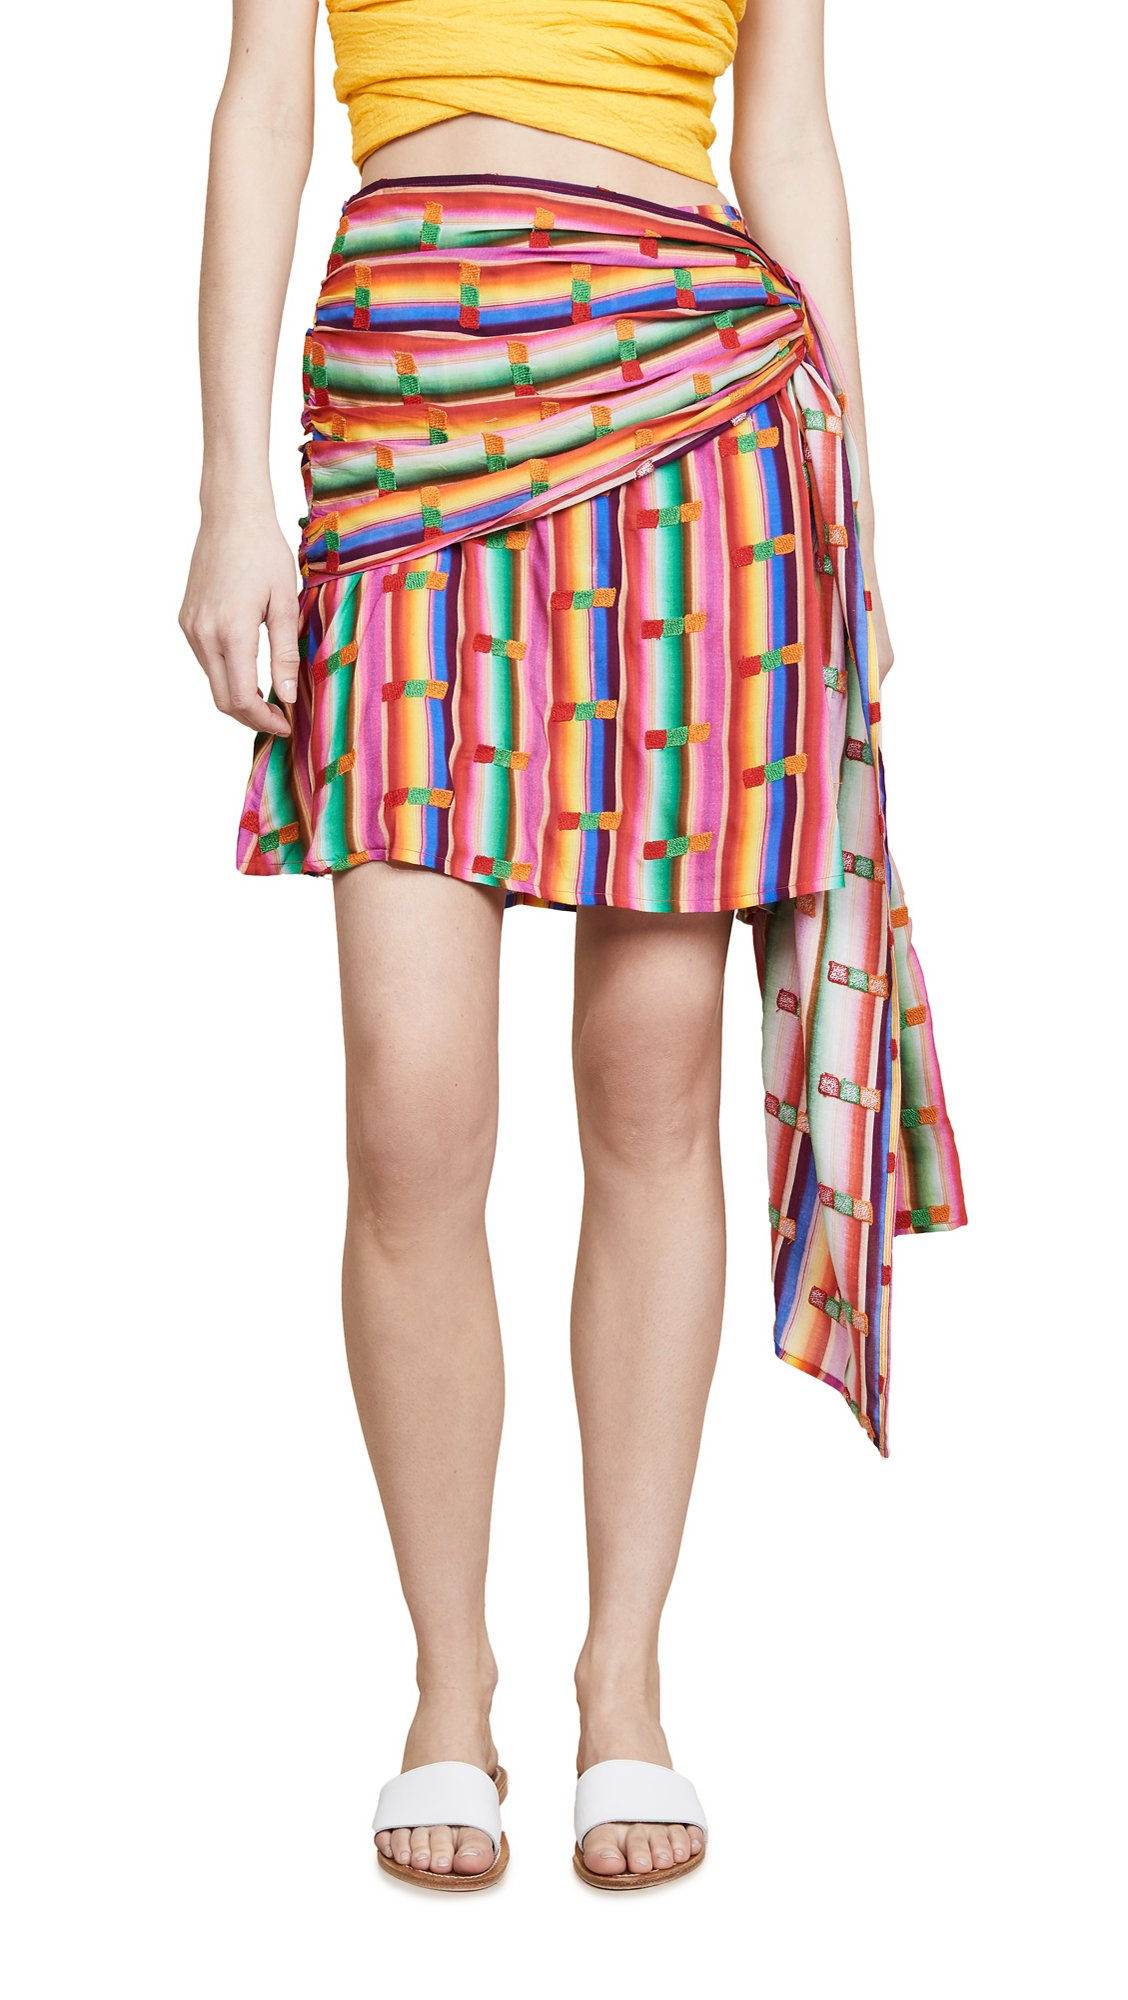 All Things Mochi Women's Roselie Skirt, Rainbow, Small